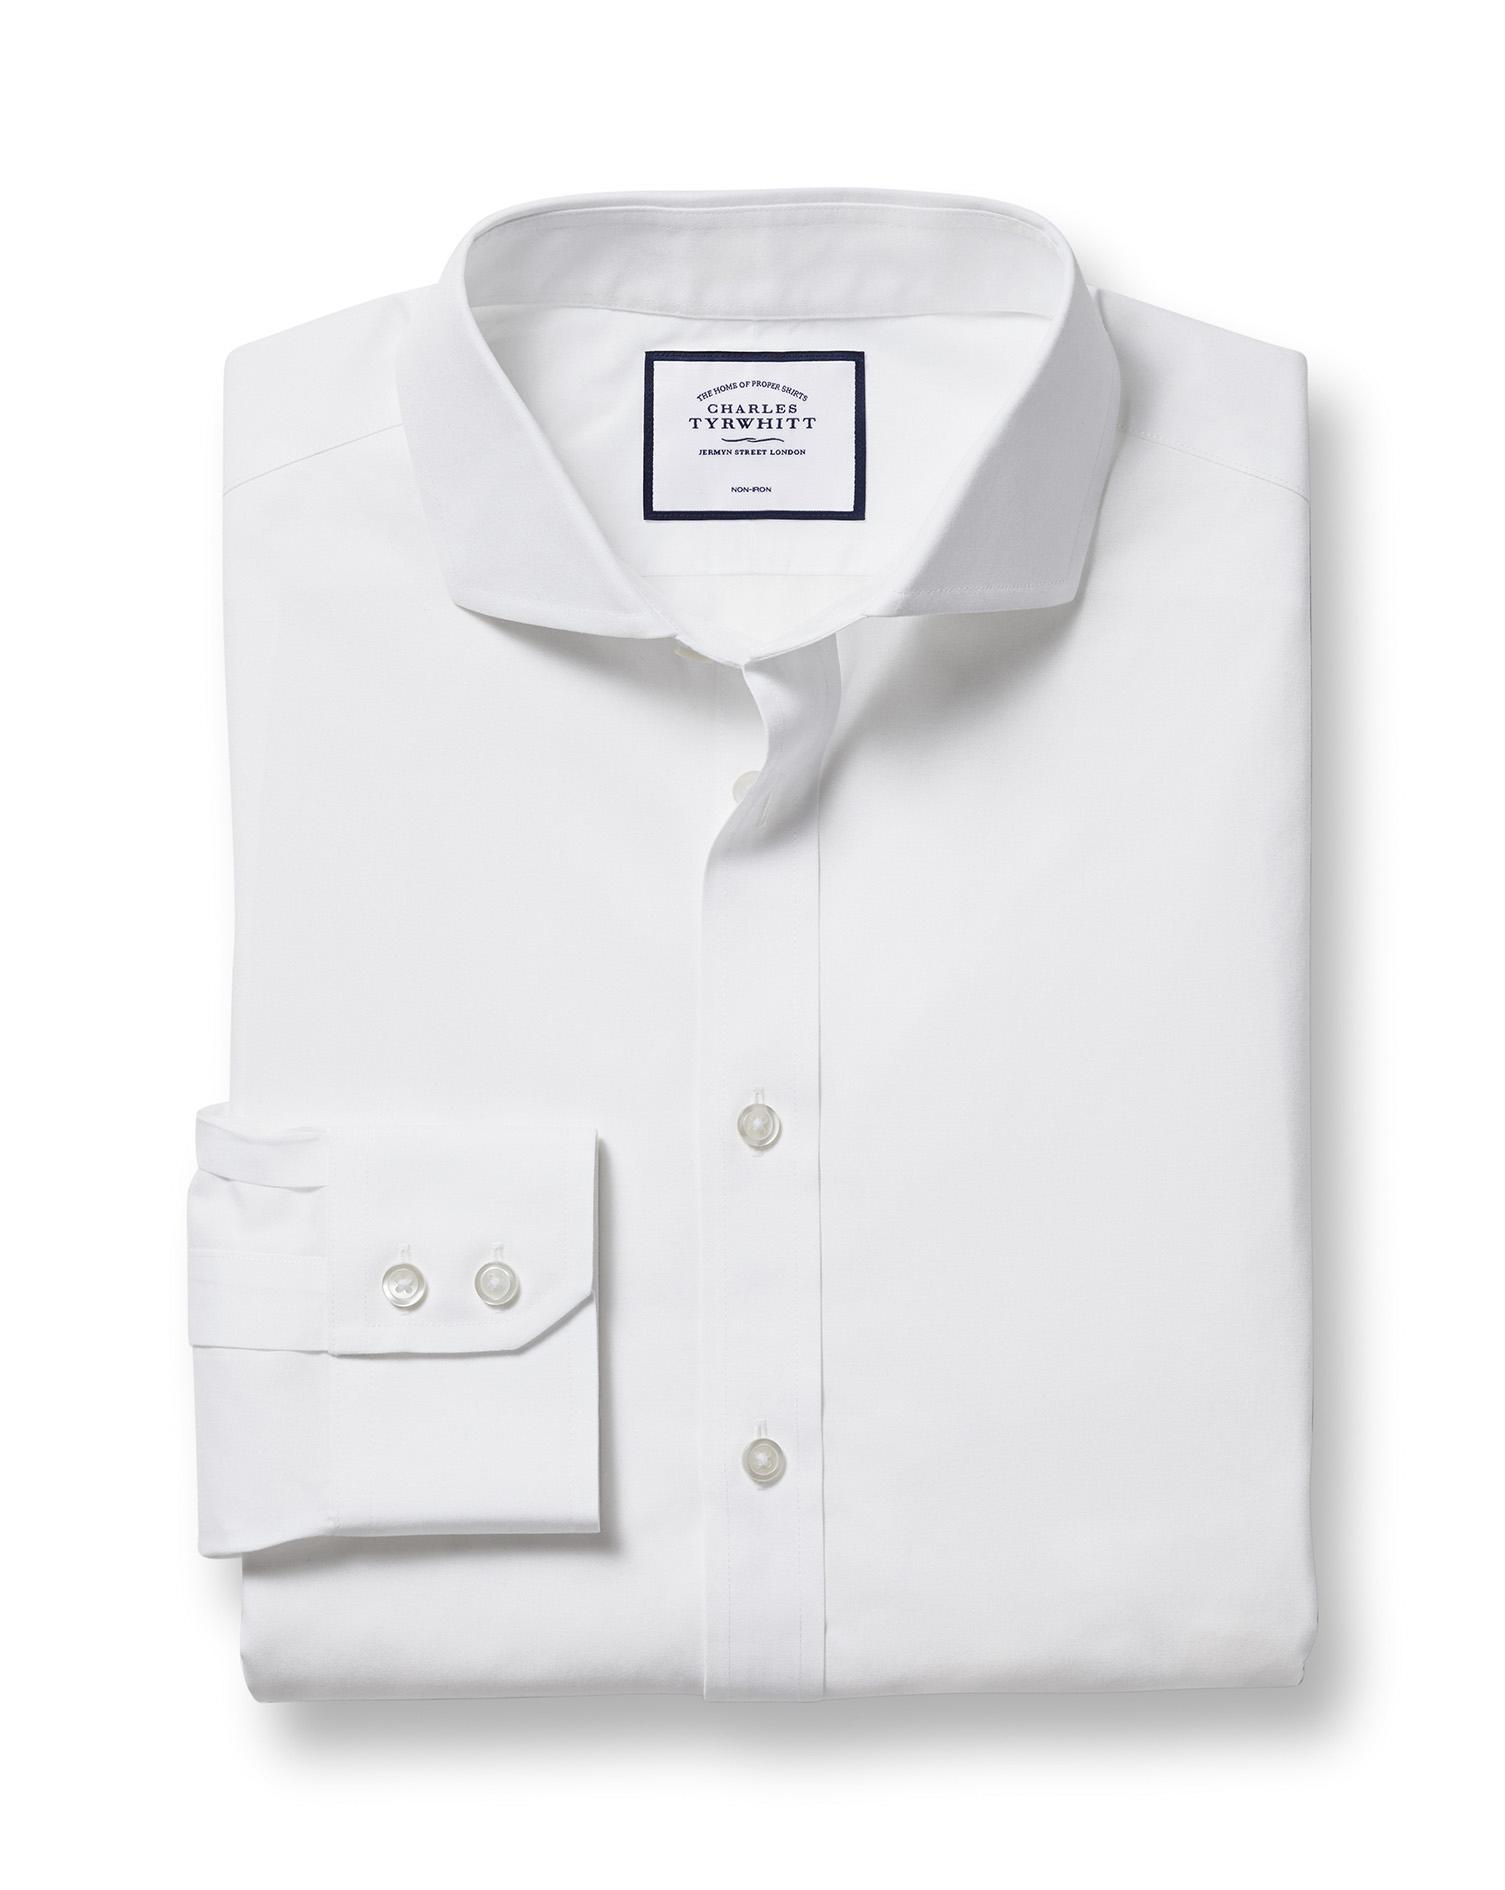 Slim Fit White Non-Iron Poplin Cutaway Collar Cotton Formal Shirt Single Cuff Size 14.5/33 by Charle